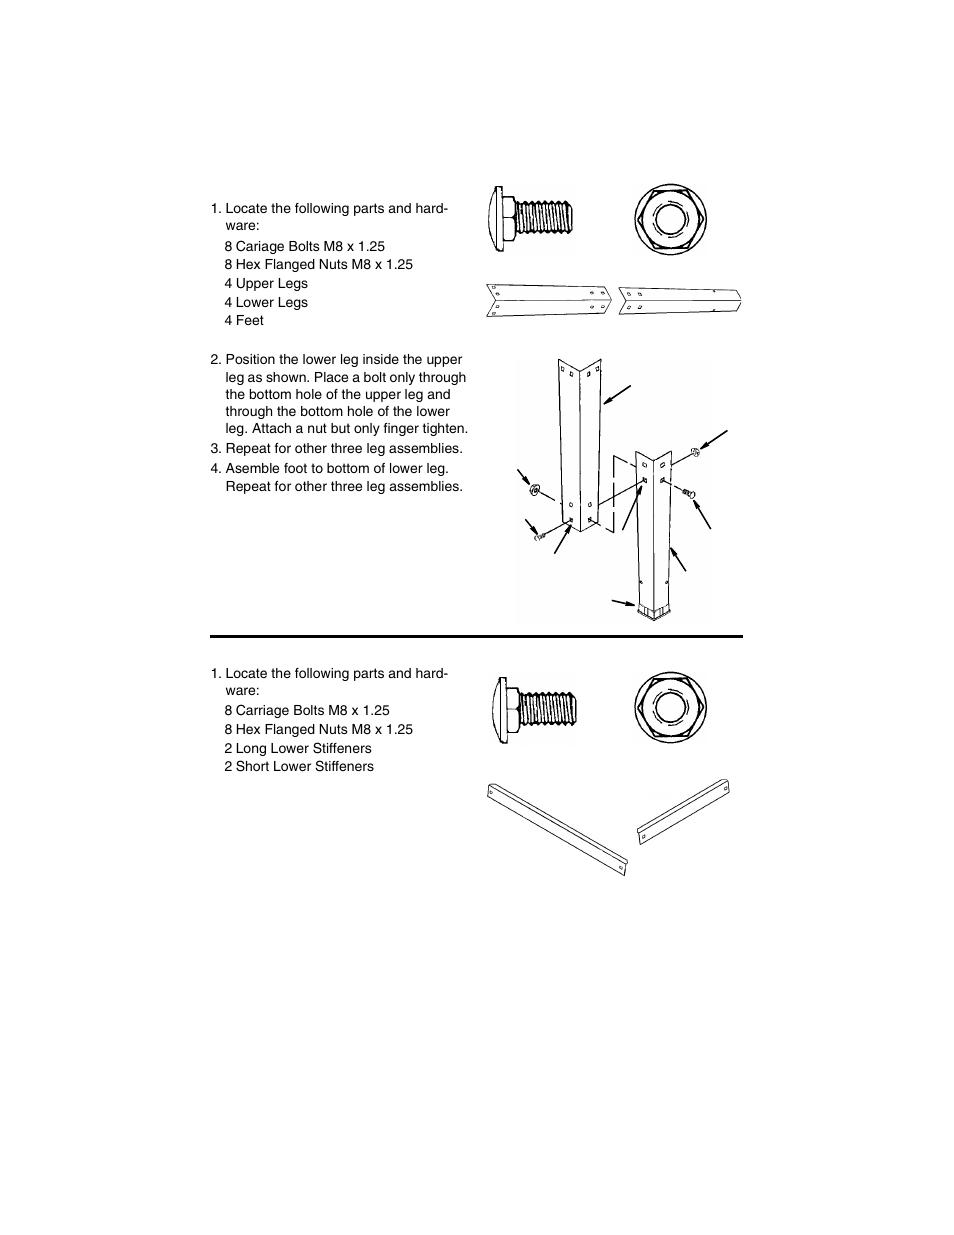 assembling upper and lower legs assembling lower stiffeners rh manualsdir com